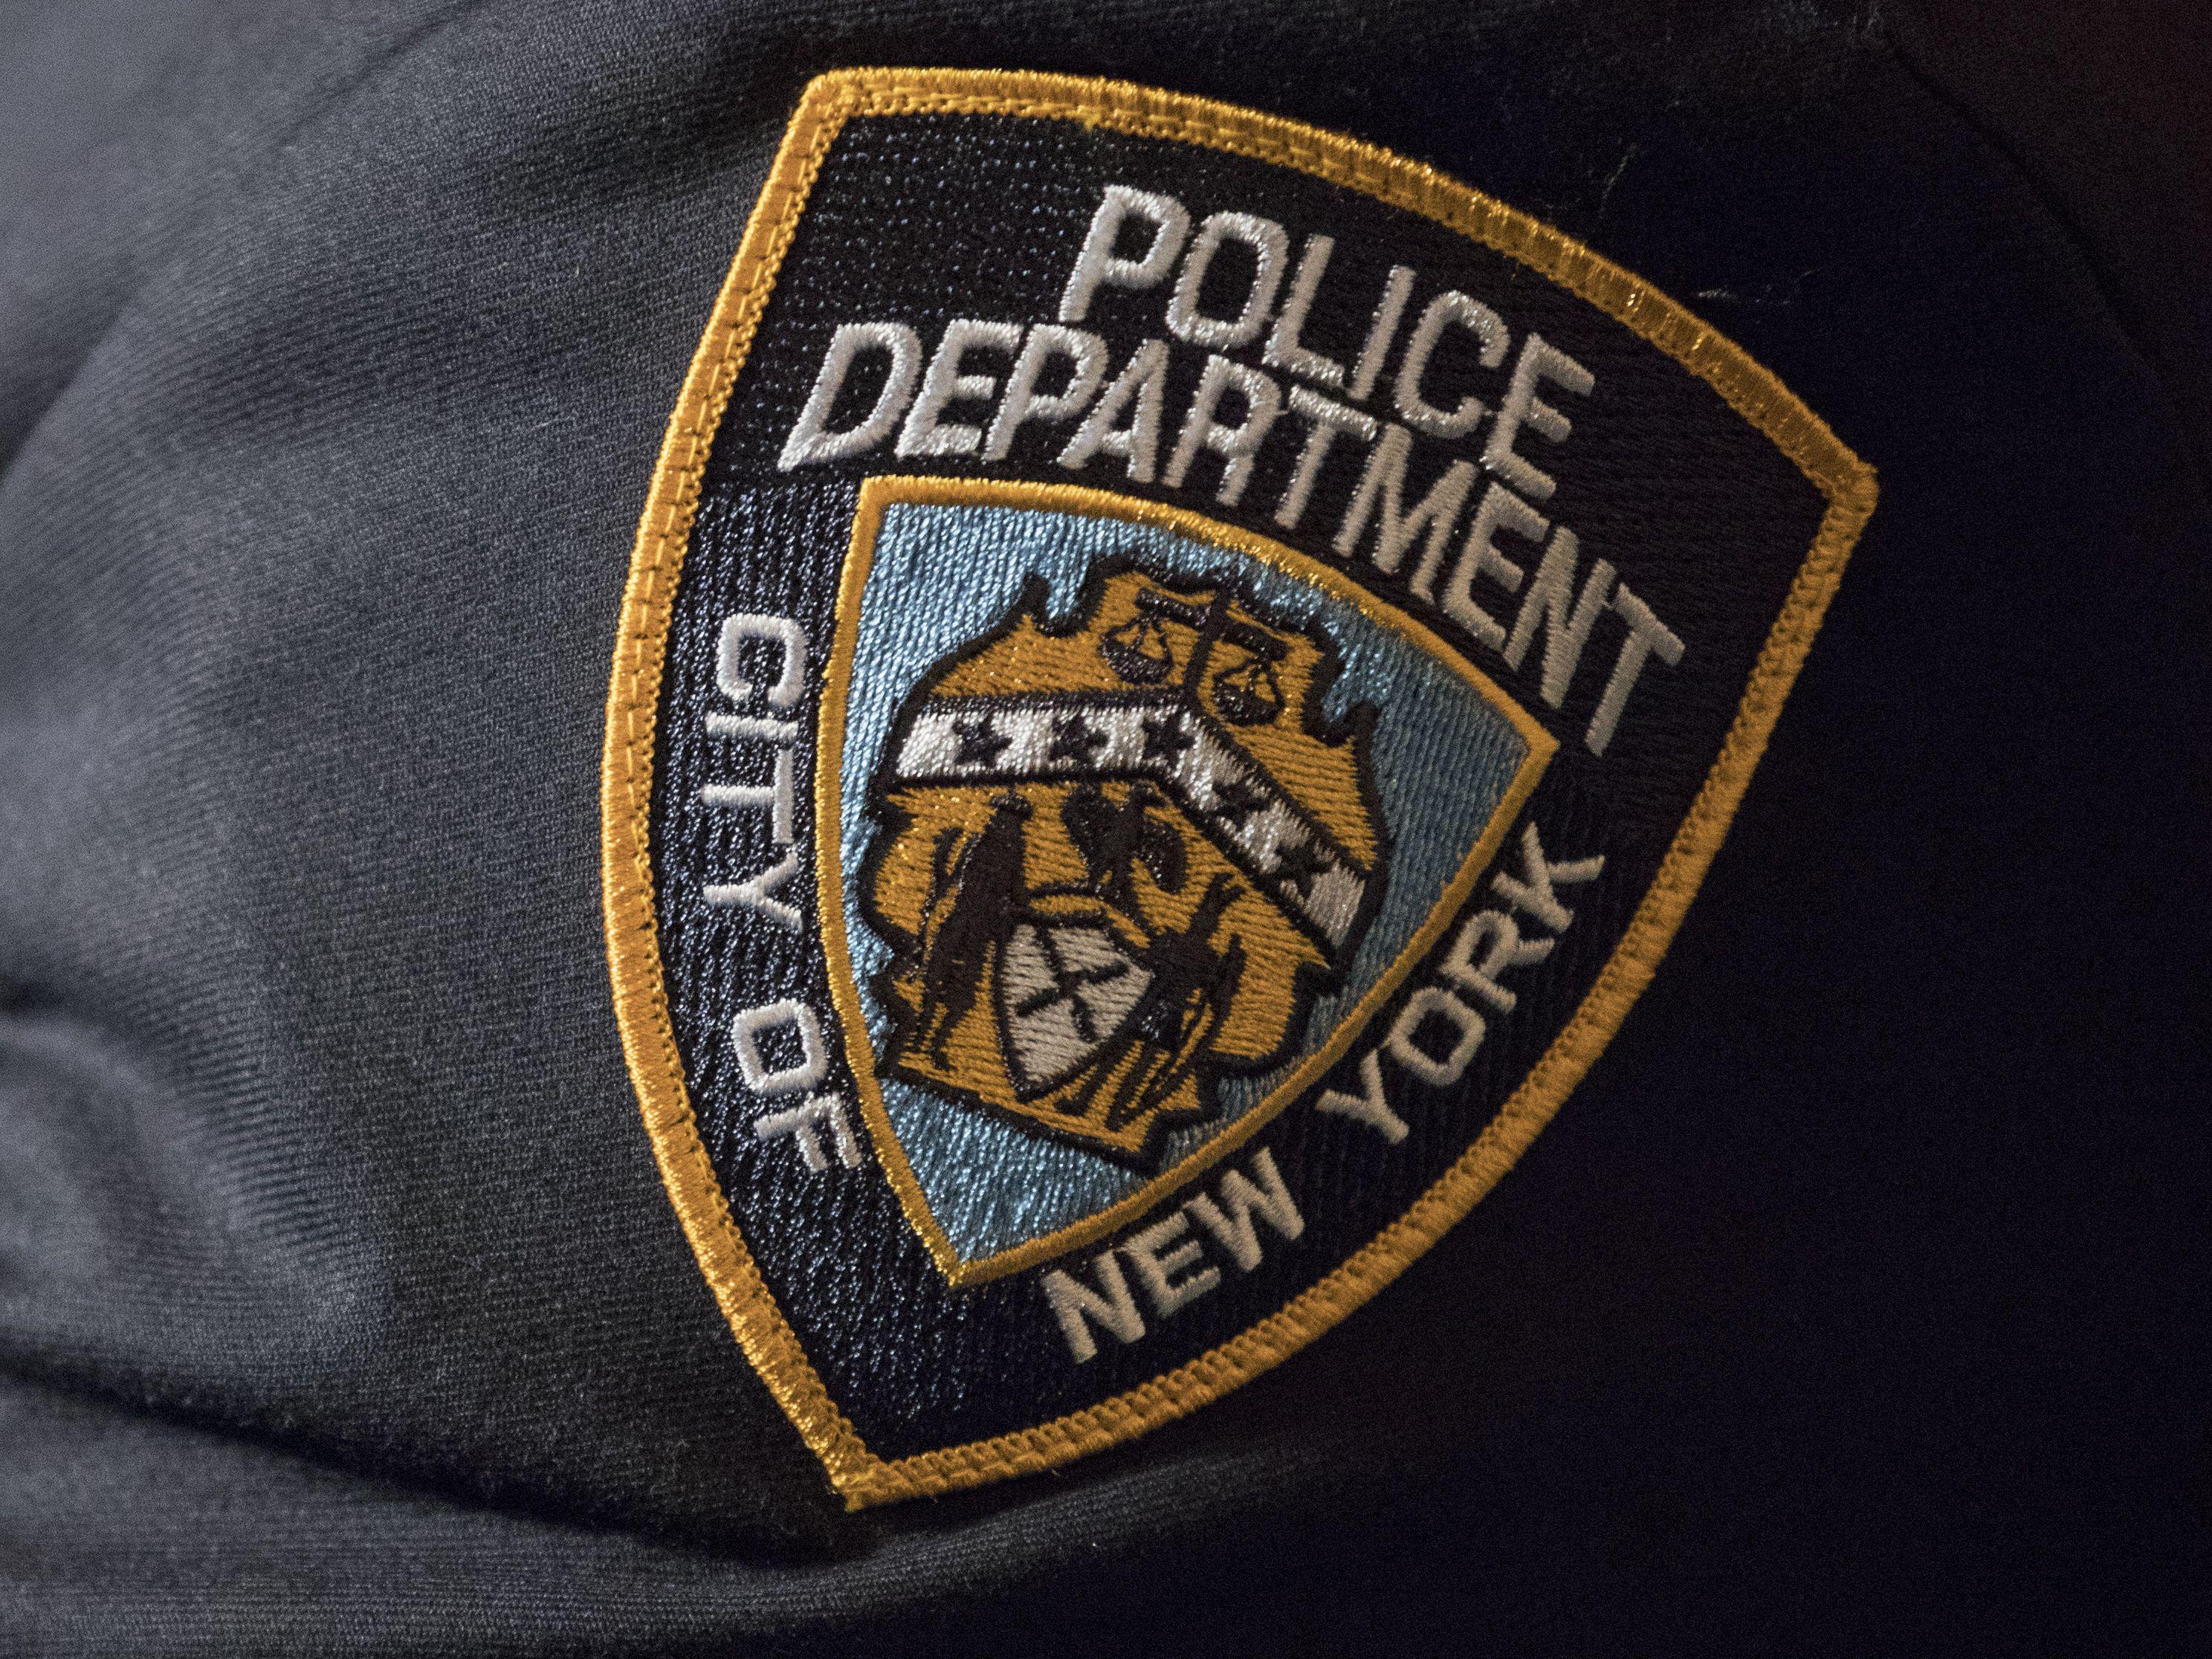 NYPD kept database of juveniles' fingerprints, violating law